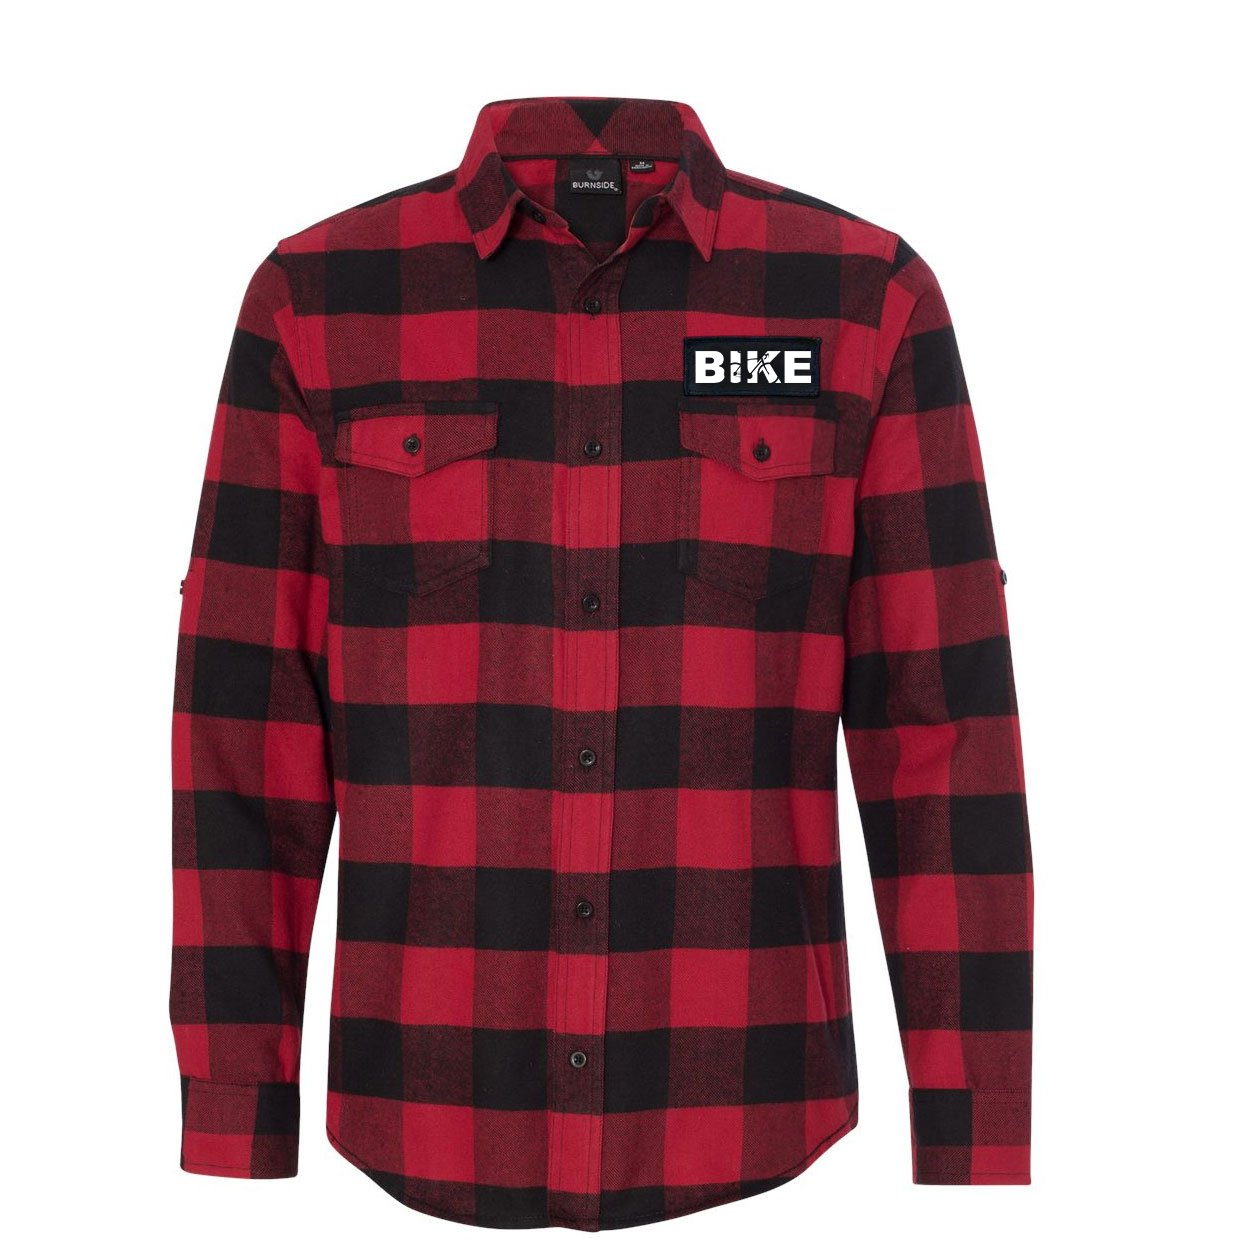 Bike Cycling Logo Classic Unisex Long Sleeve Woven Patch Flannel Shirt Red/Black Buffalo (White Logo)